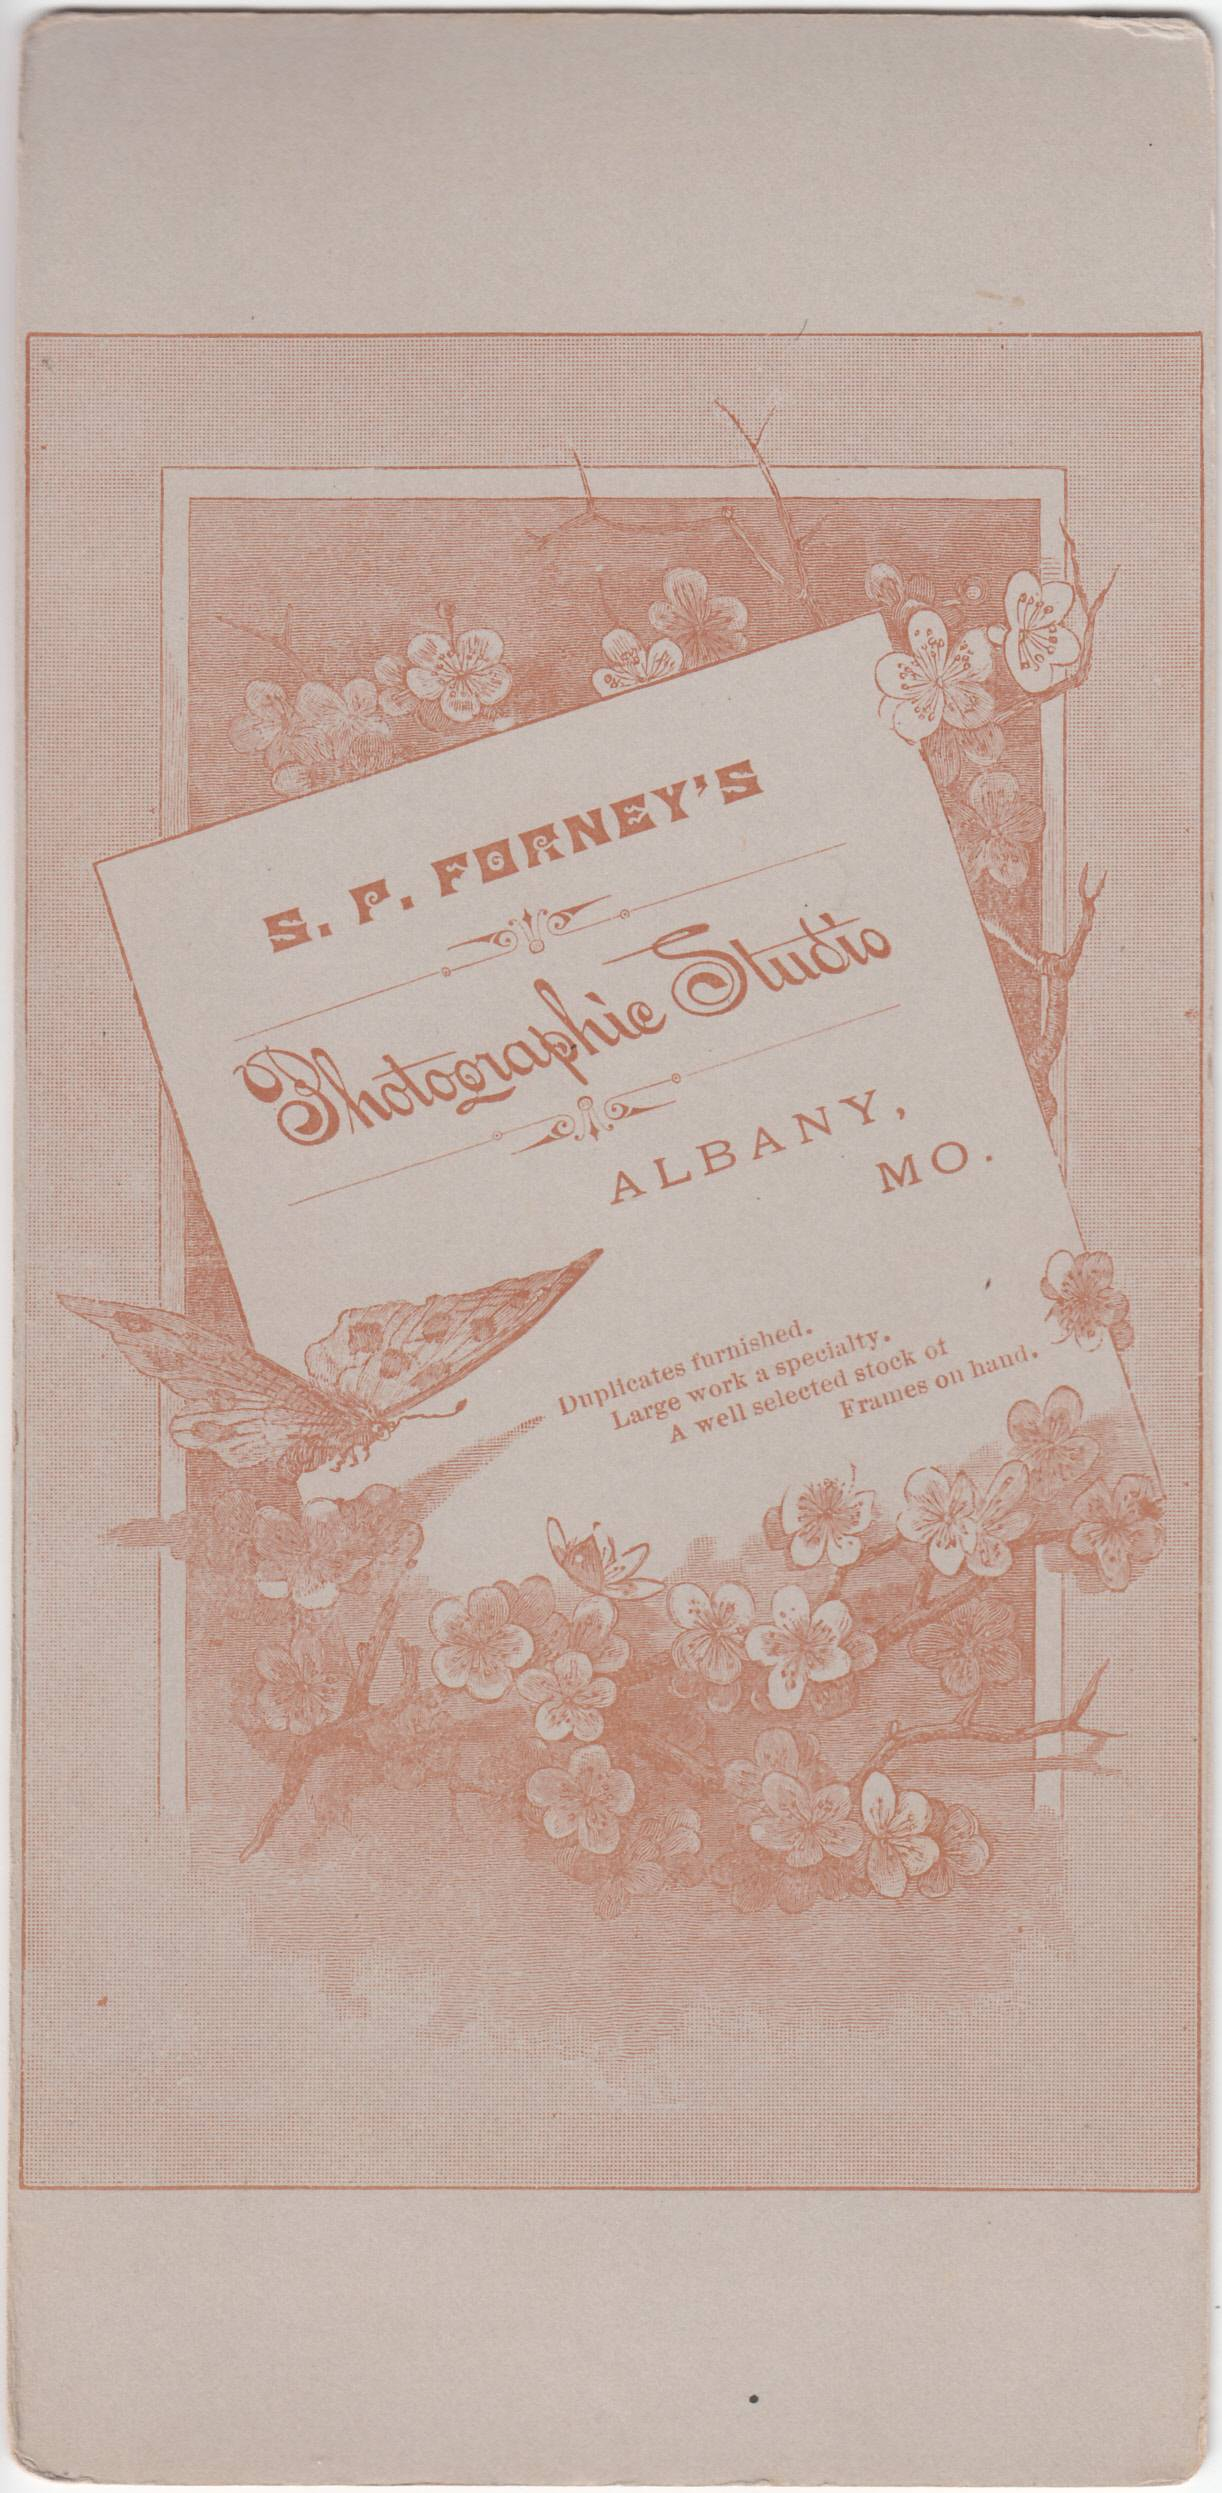 Samuel P. Forney, photographer of Albany, Missouri